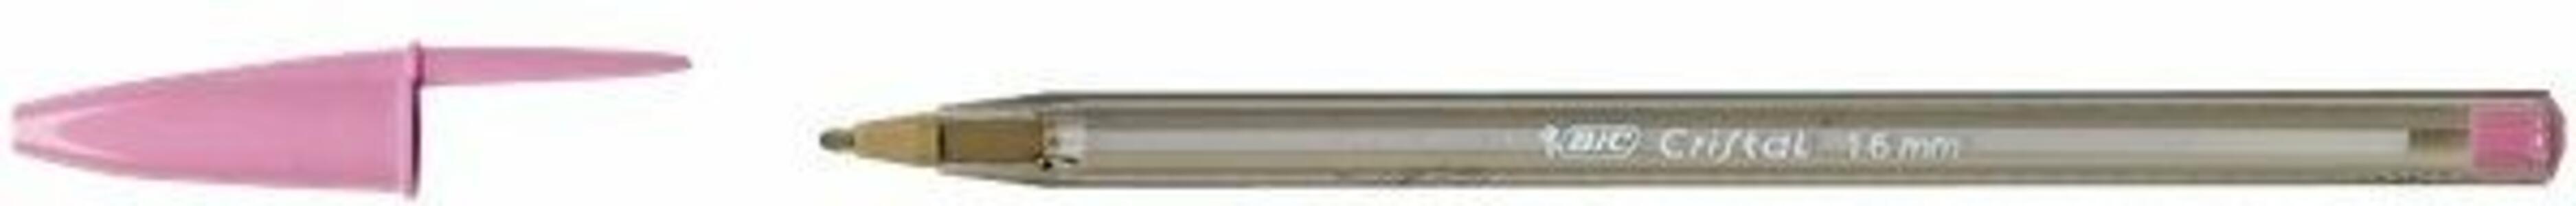 Penna a sfera Bic Cristal large punta 1,6 mm. Confezione 20 colori assortiti